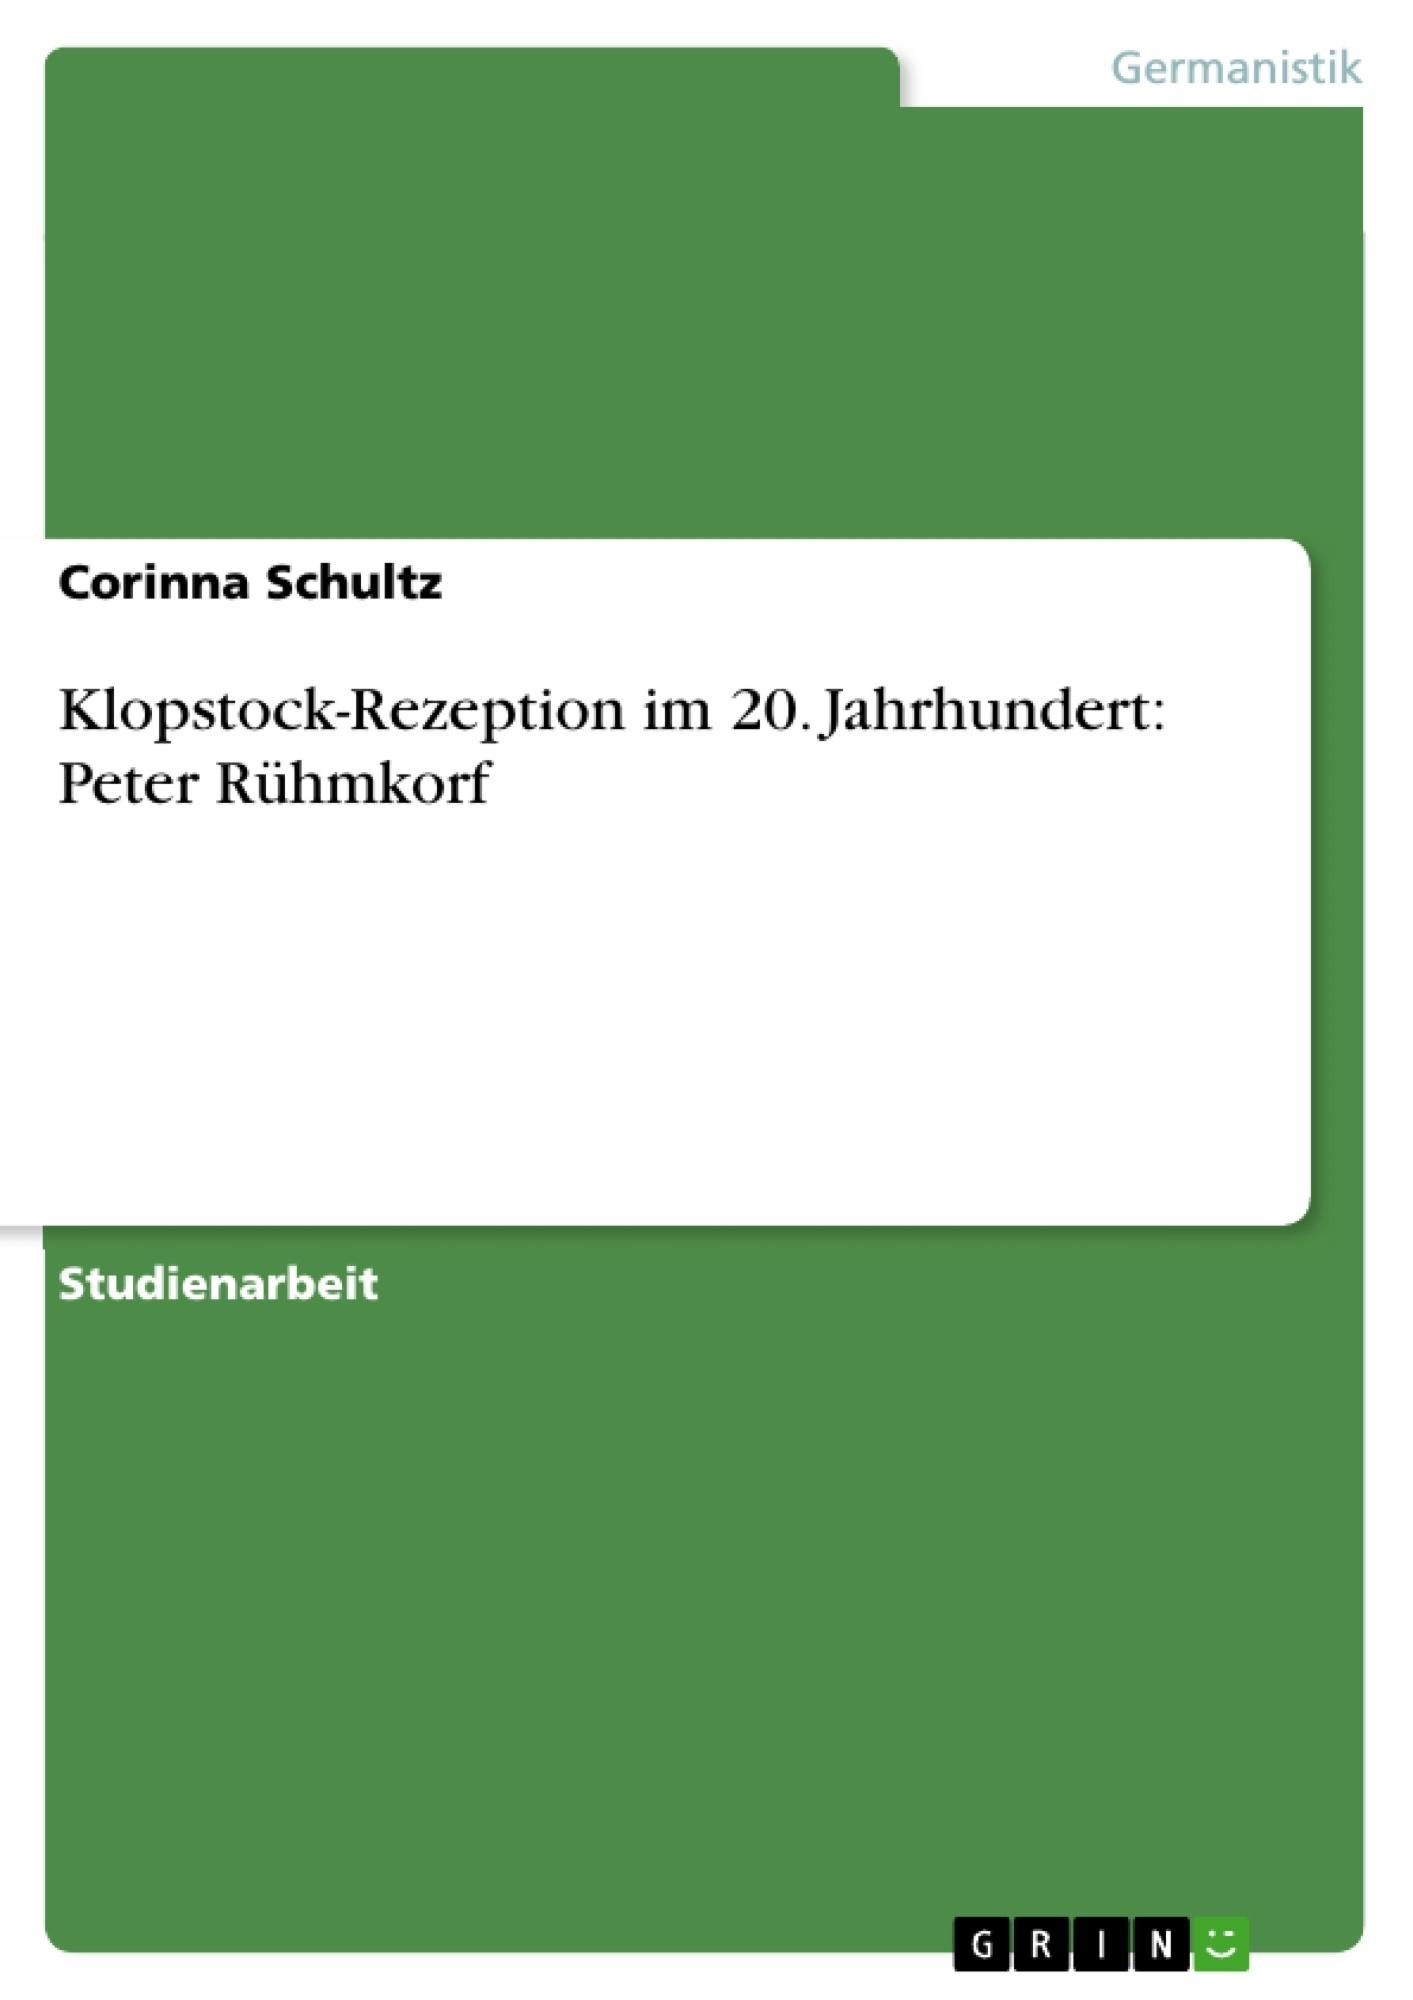 Titel: Klopstock-Rezeption im 20. Jahrhundert: Peter Rühmkorf